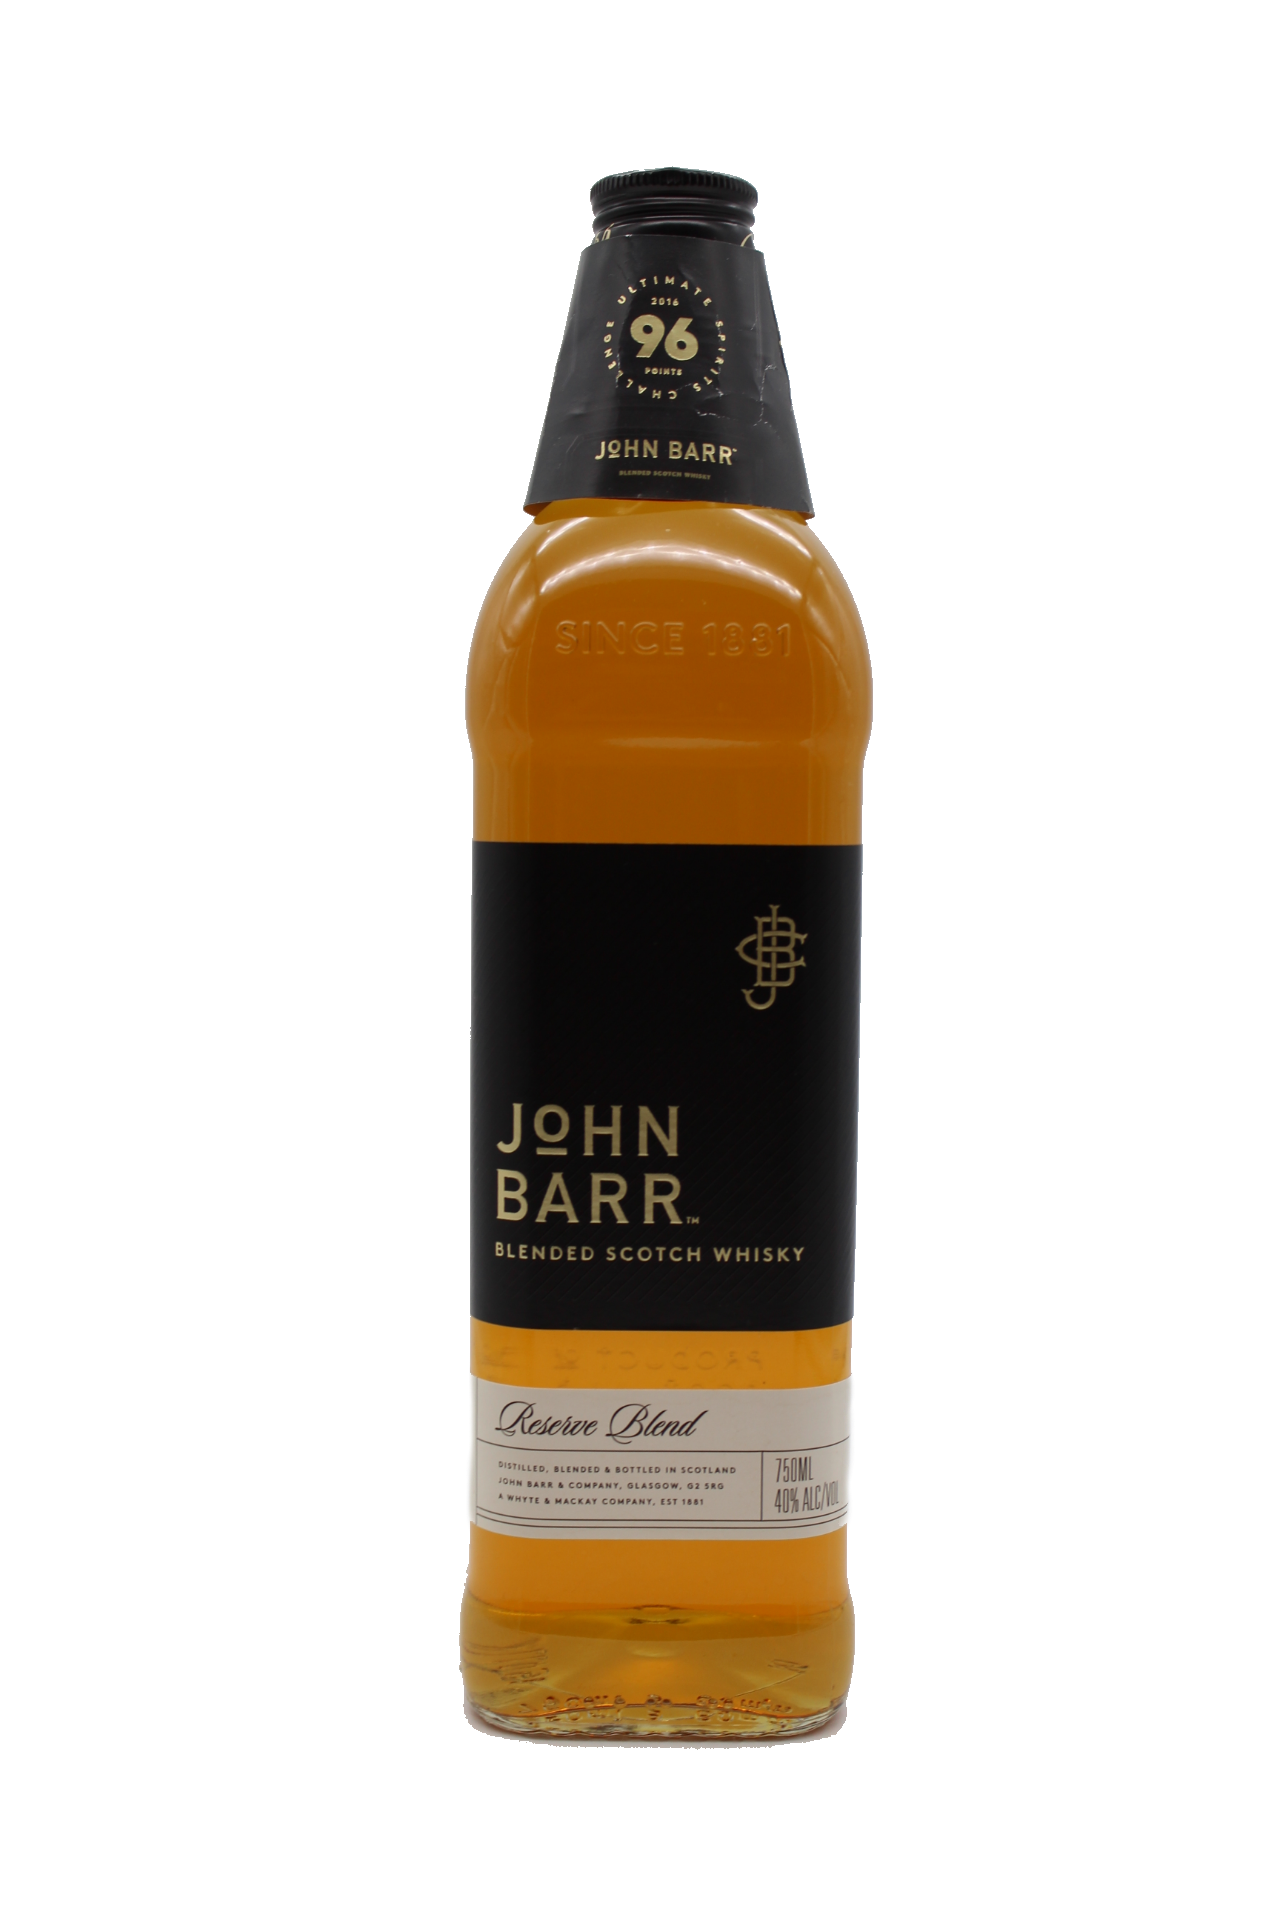 Обзор виски john barr (джон барр)